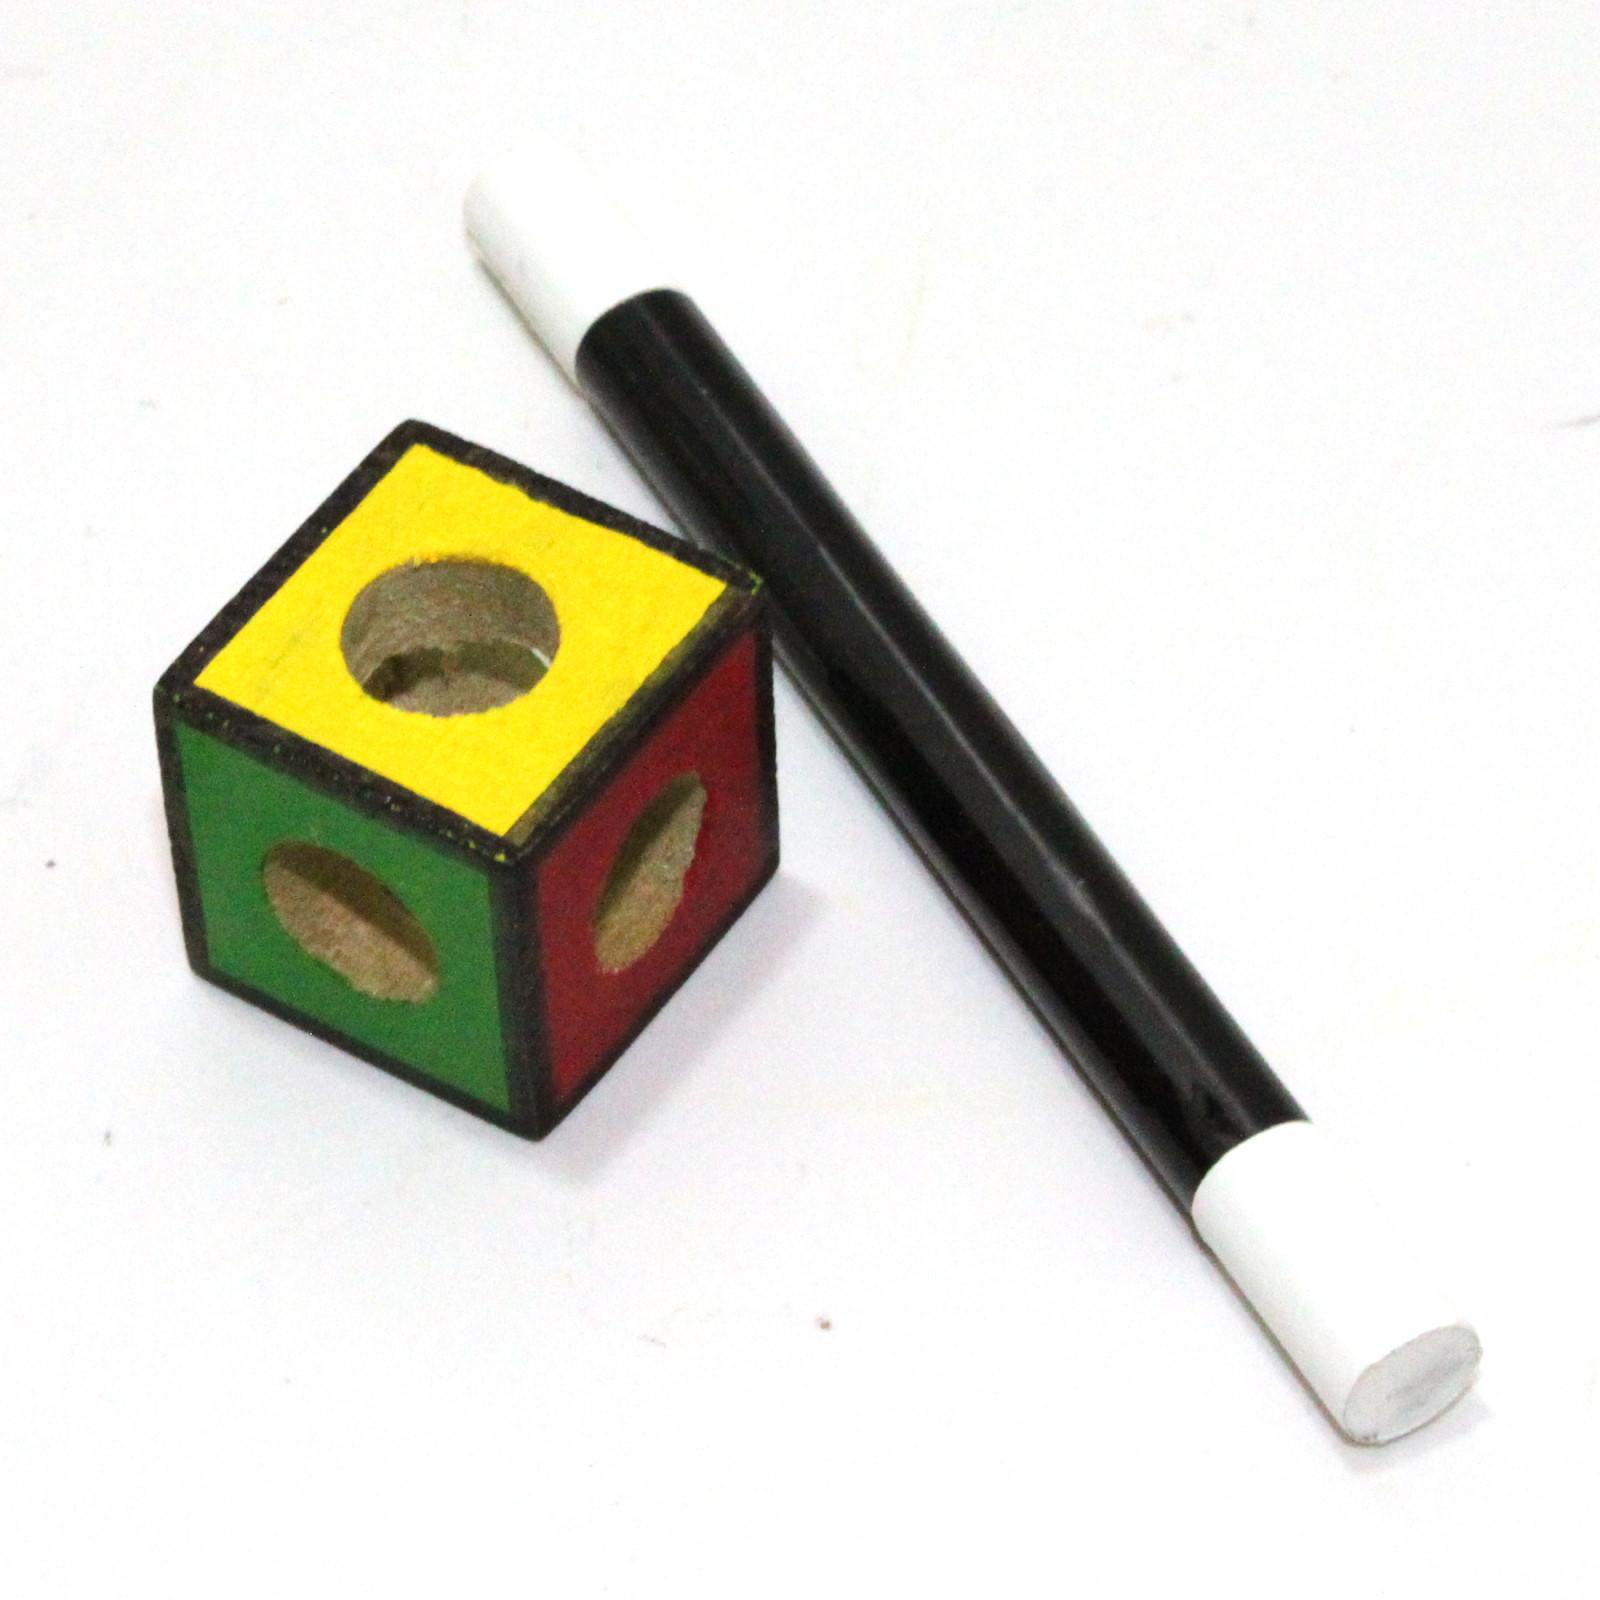 Bermuda Cube by Willi Wessel